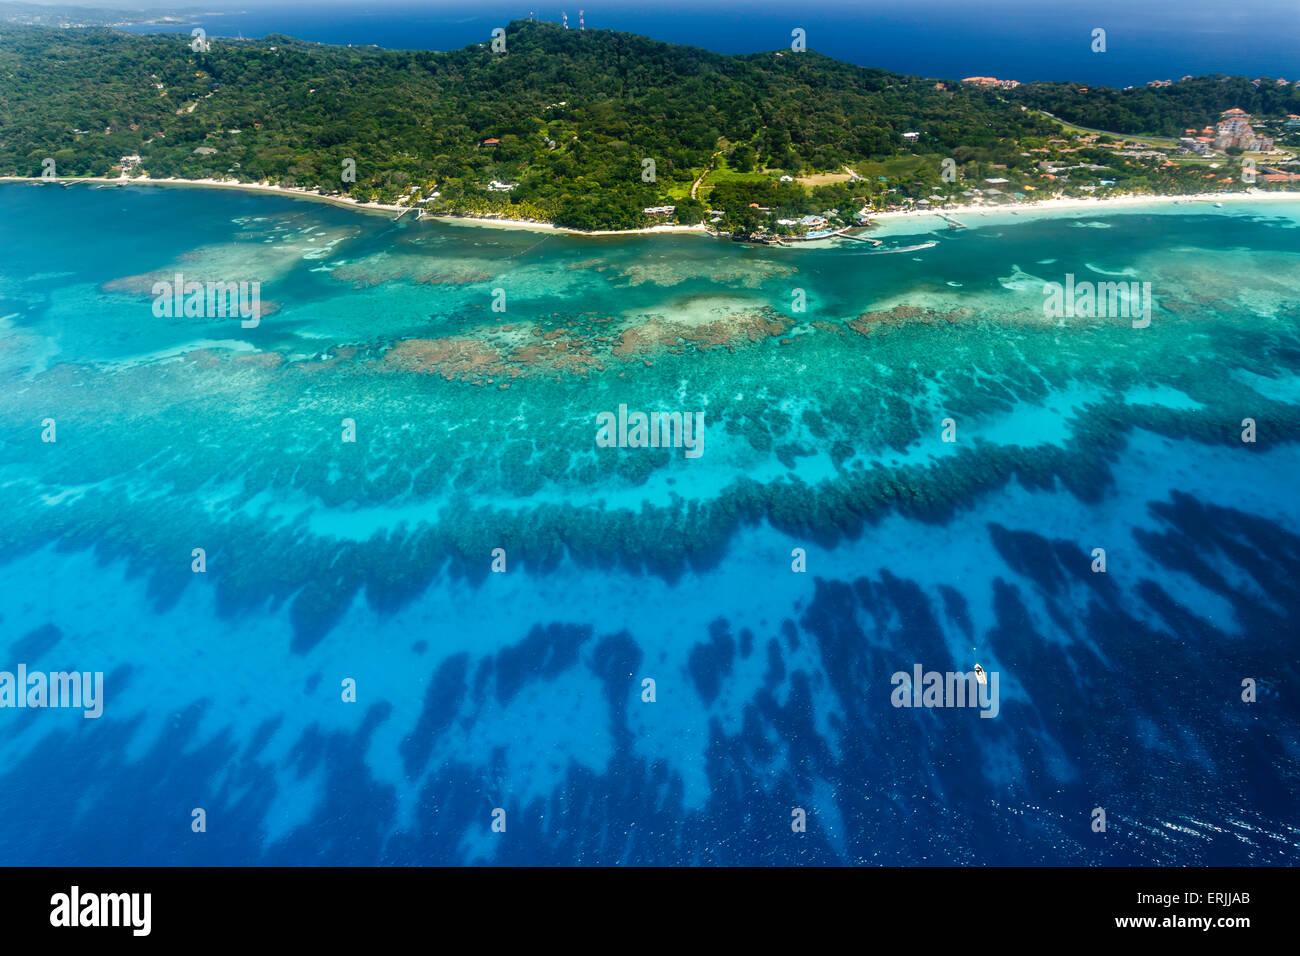 Aerial image coral reef off shore of Roatan island - Stock Image